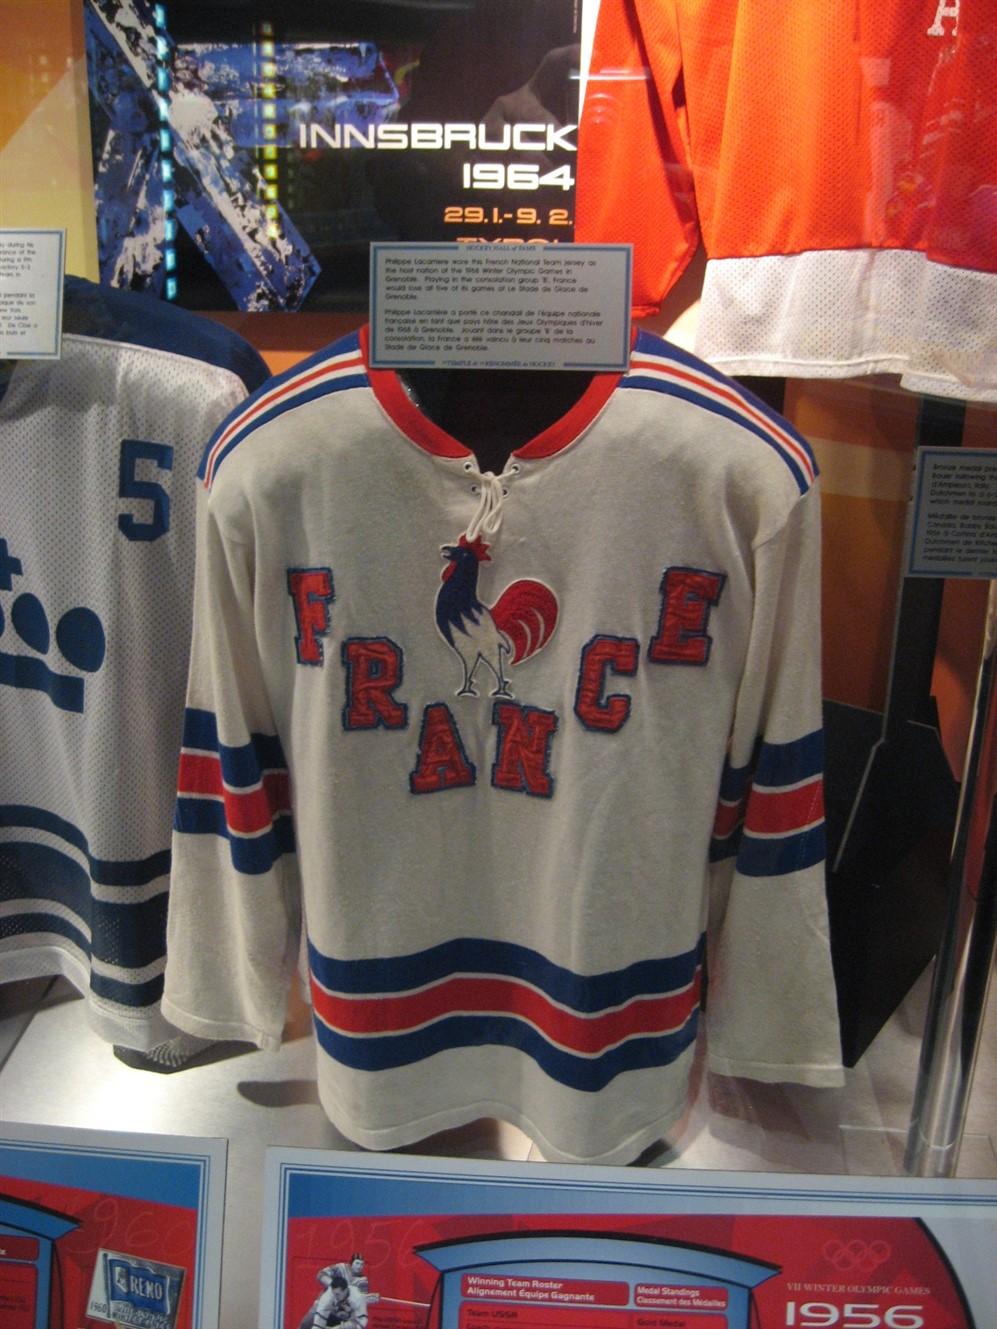 2008 07 05 90 Toronto Hockey Hall of Fame.jpg